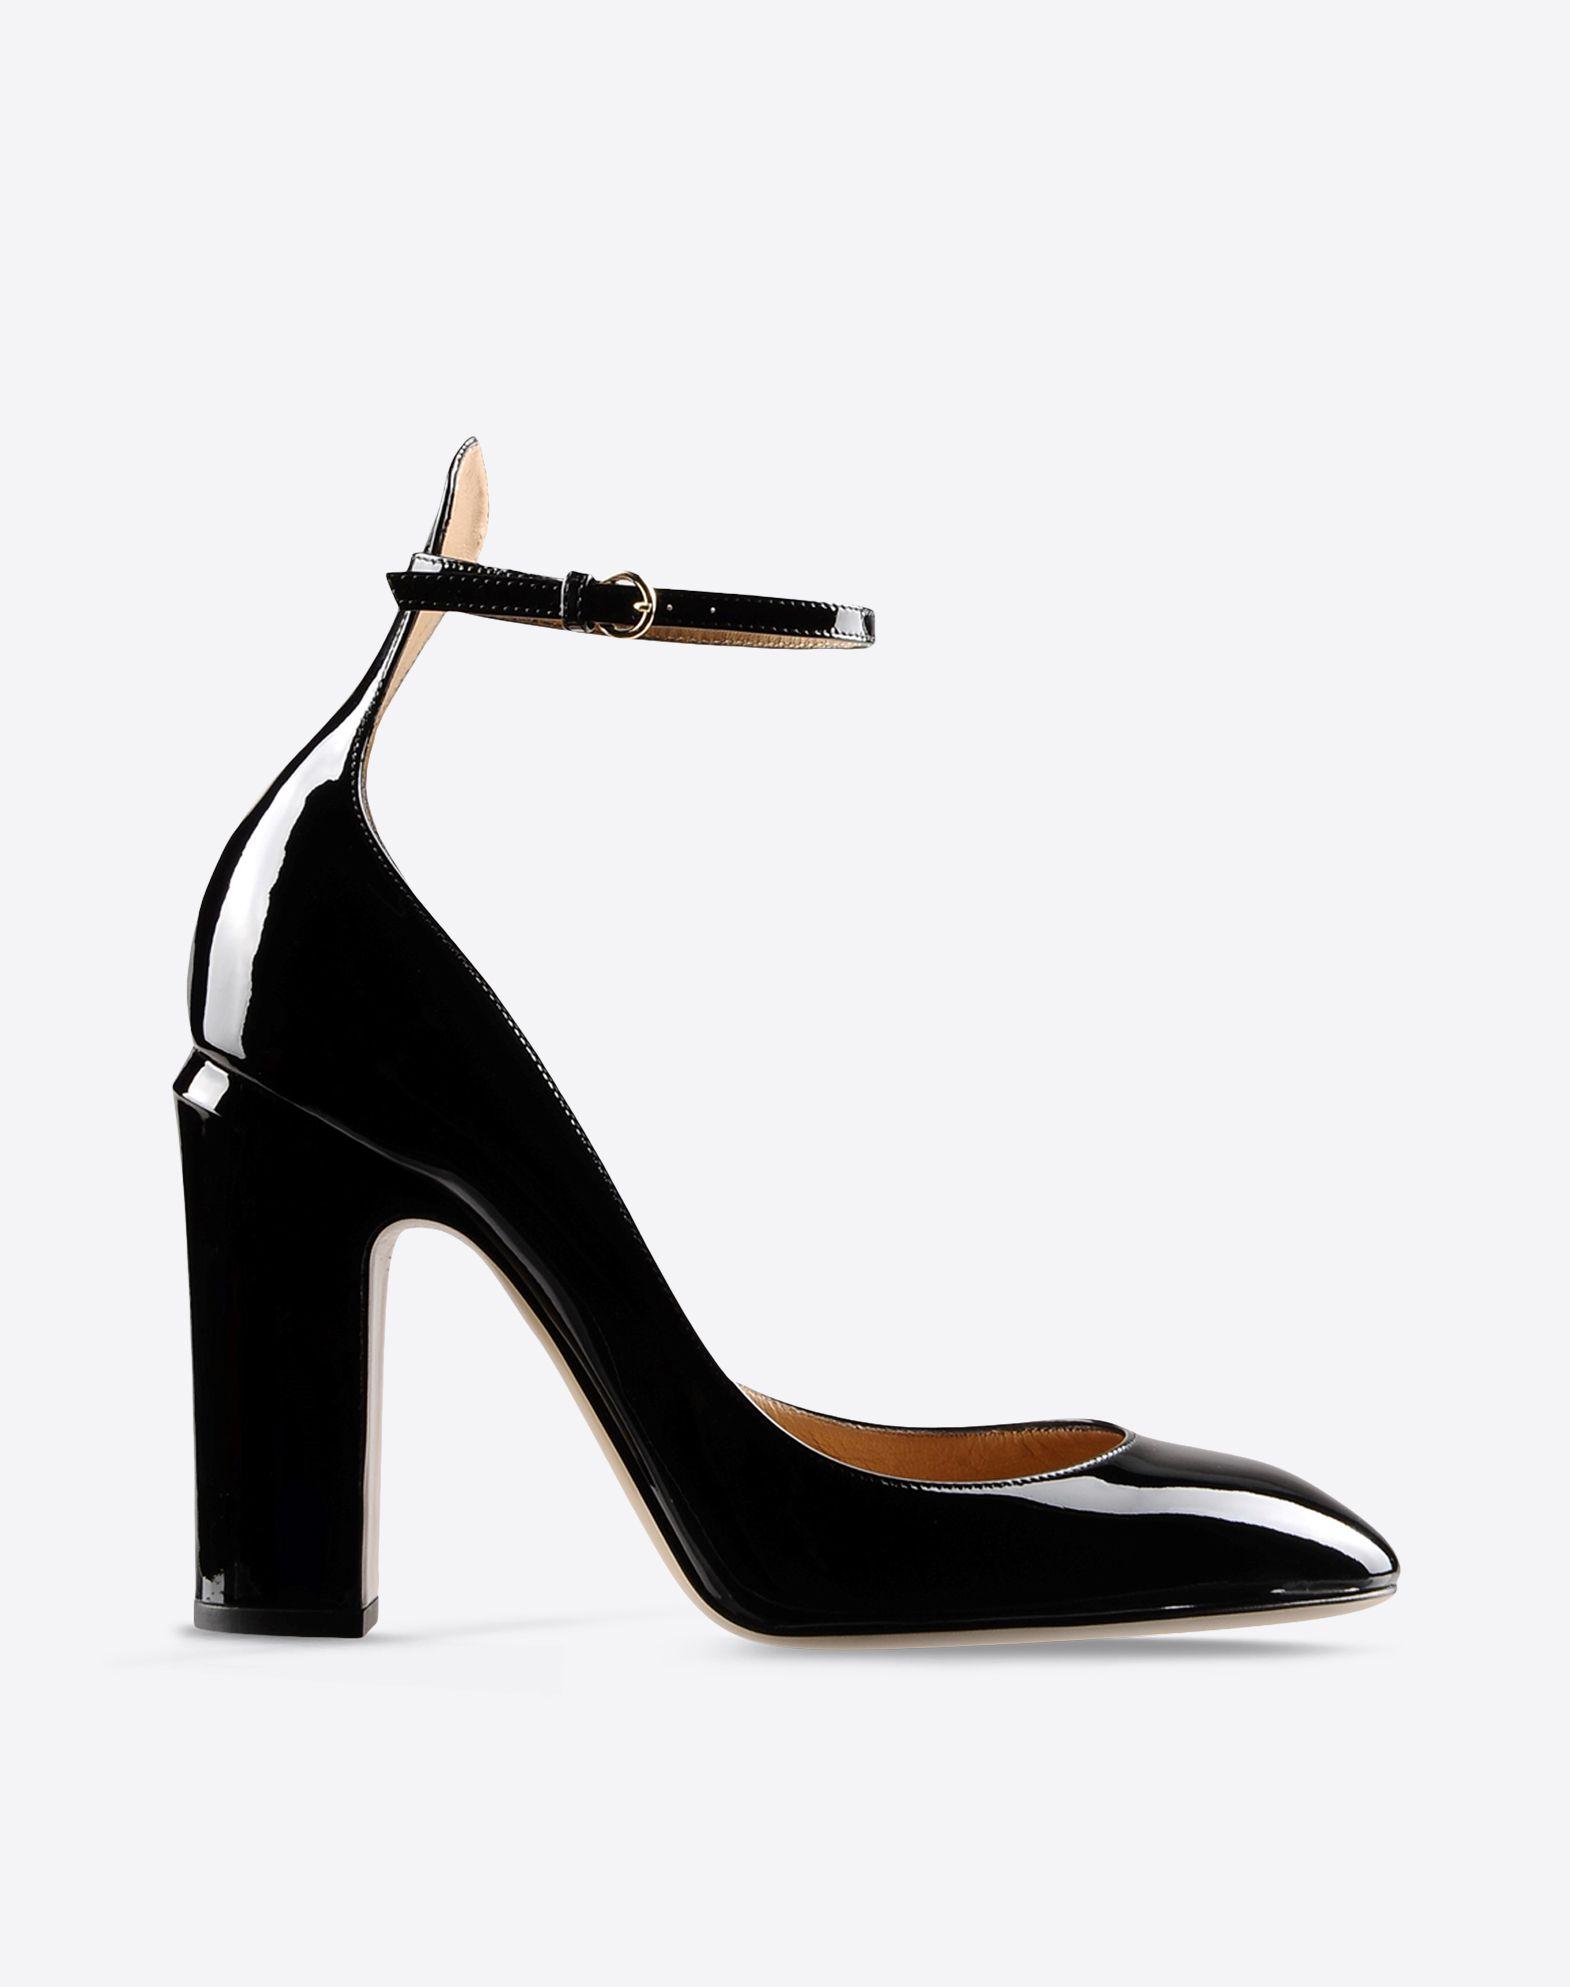 Valentino Garavani Tango Patent-leather Pumps - Black Valentino Get Authentic Cheap Price Free Shipping Shopping Online gTkgXV0DrJ